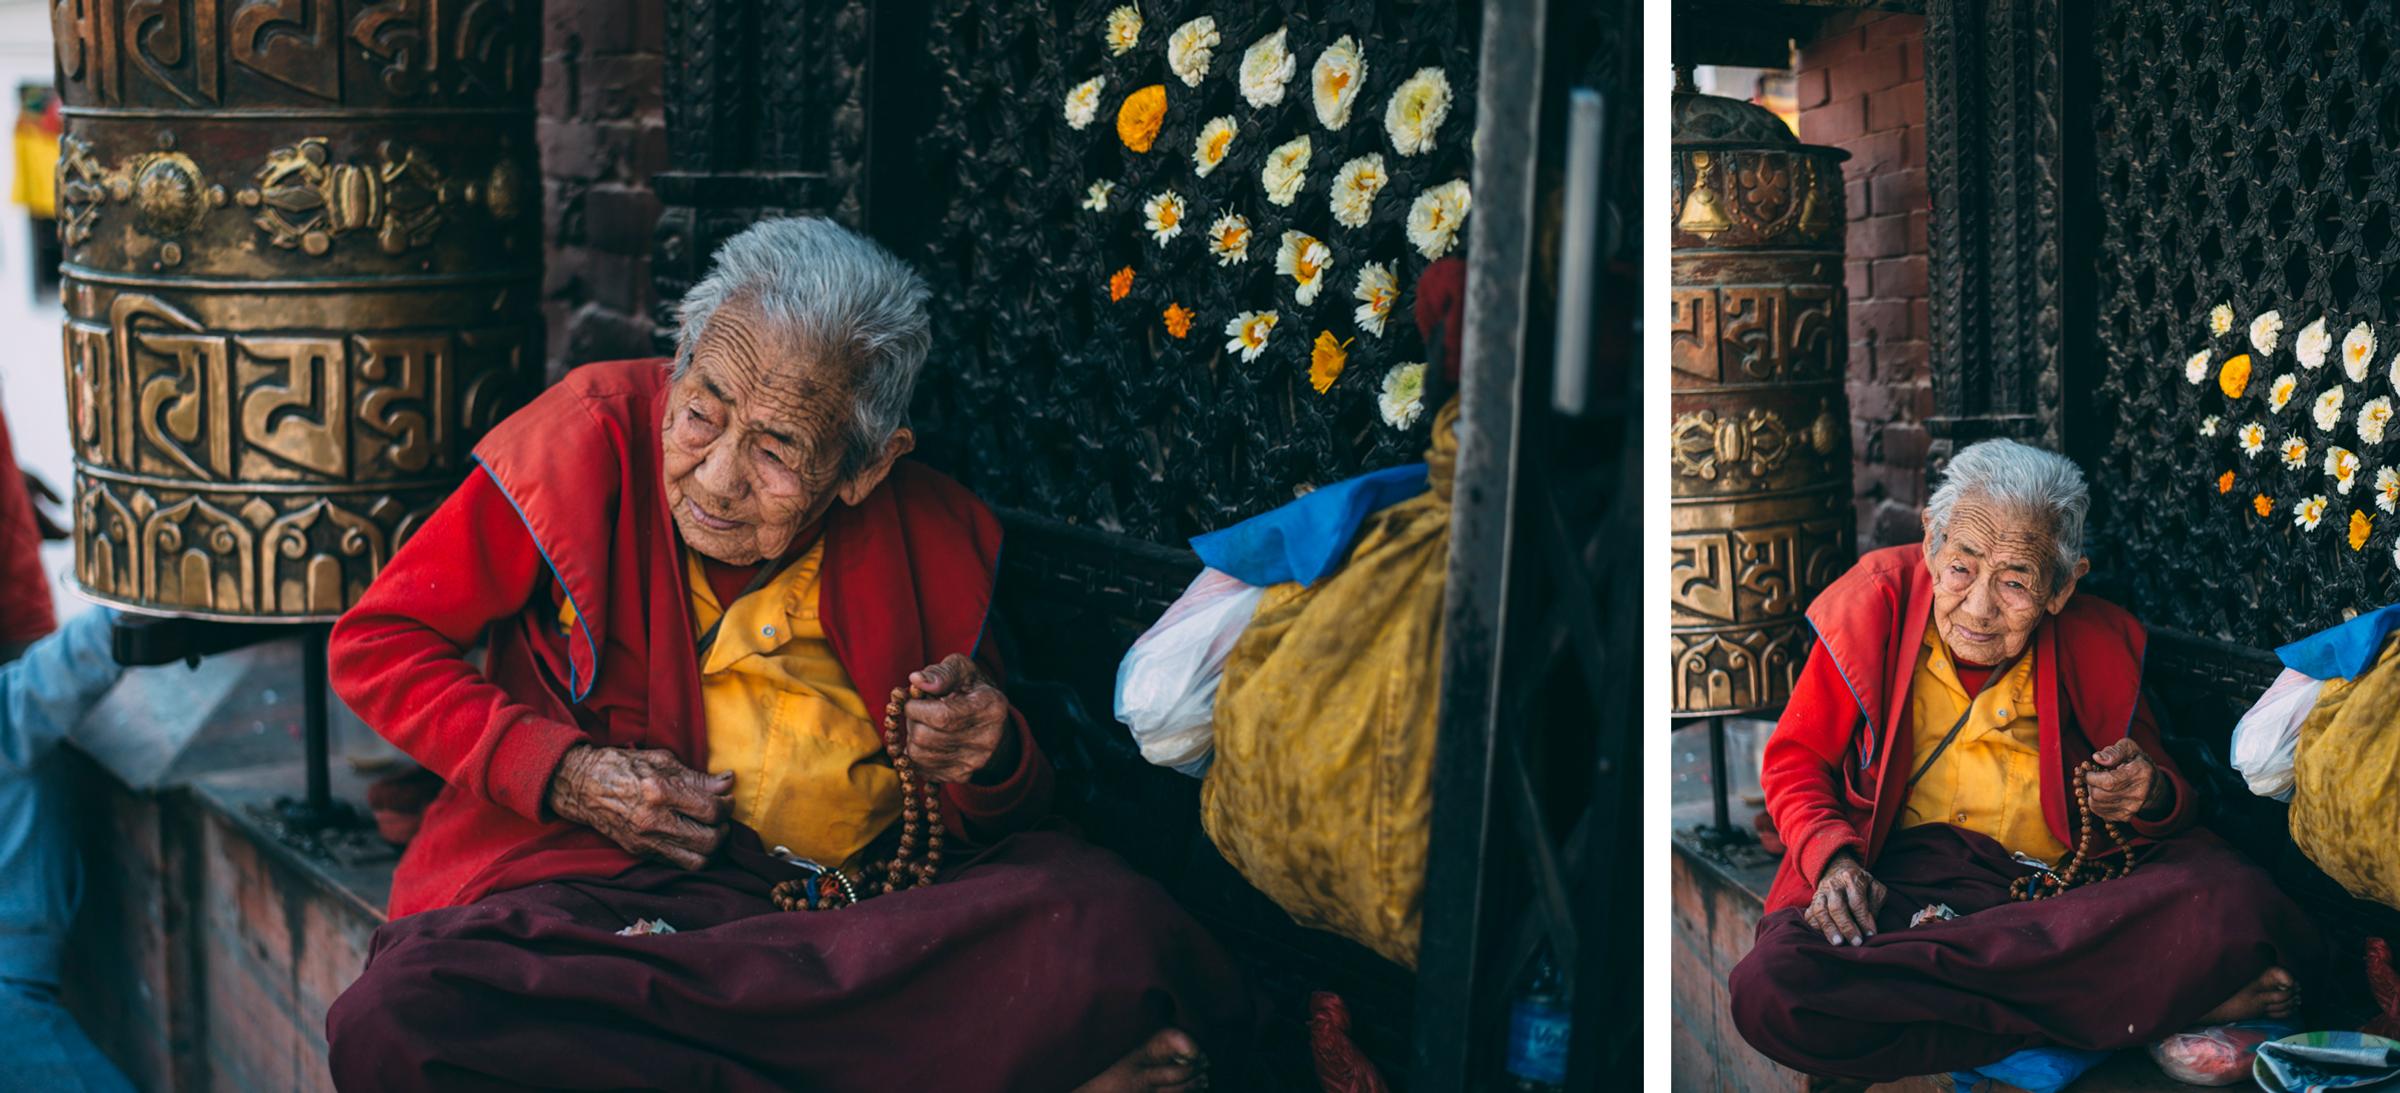 49-Nepal-Blog-Lola-Photography_001.jpg